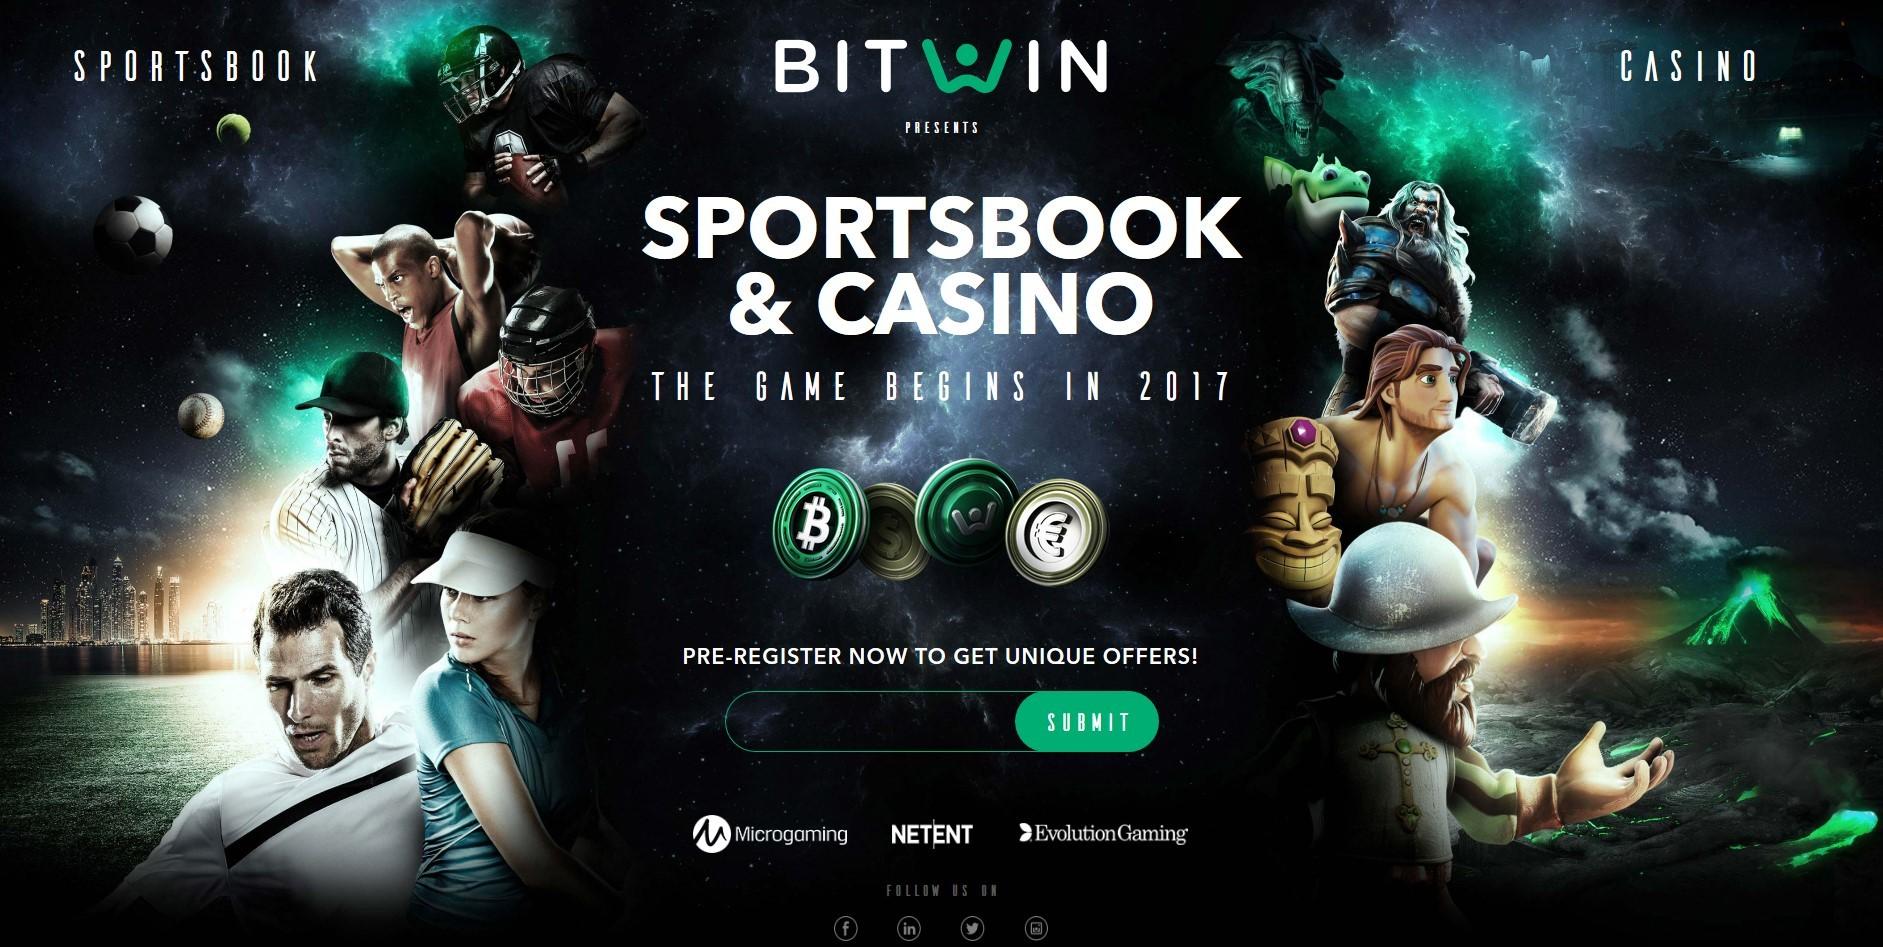 Bitwin.com - Online Sportsbook and Casino | LinkedIn